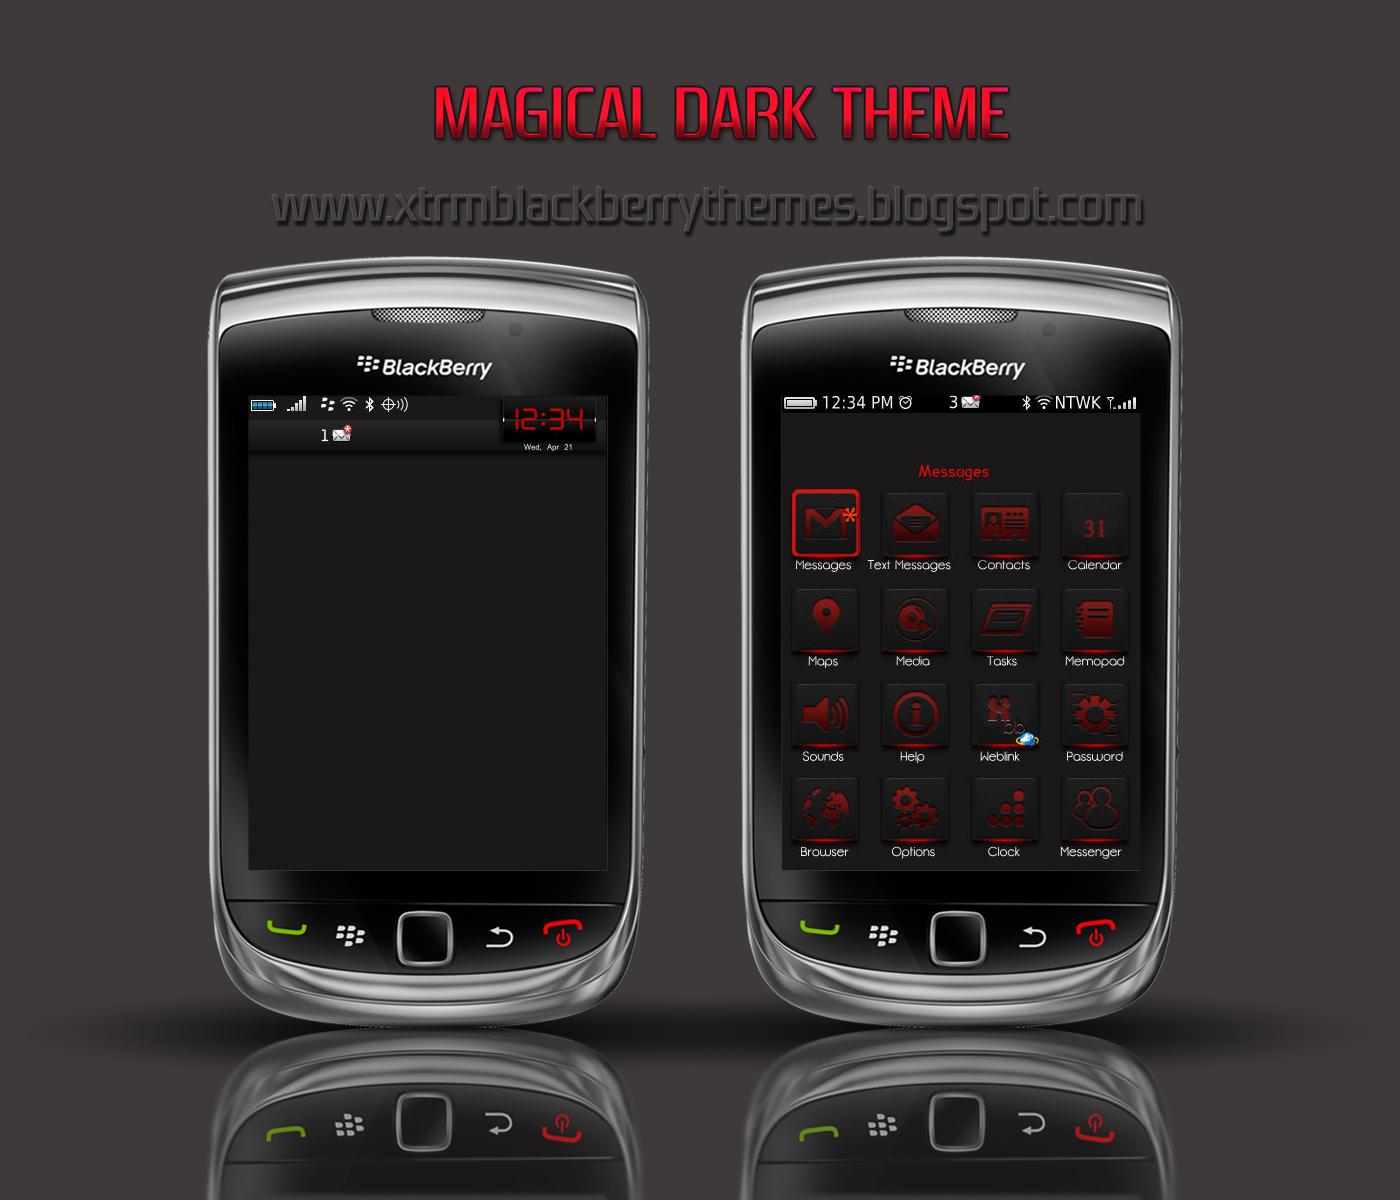 blackberry bold 9700 os 6 vodafone download